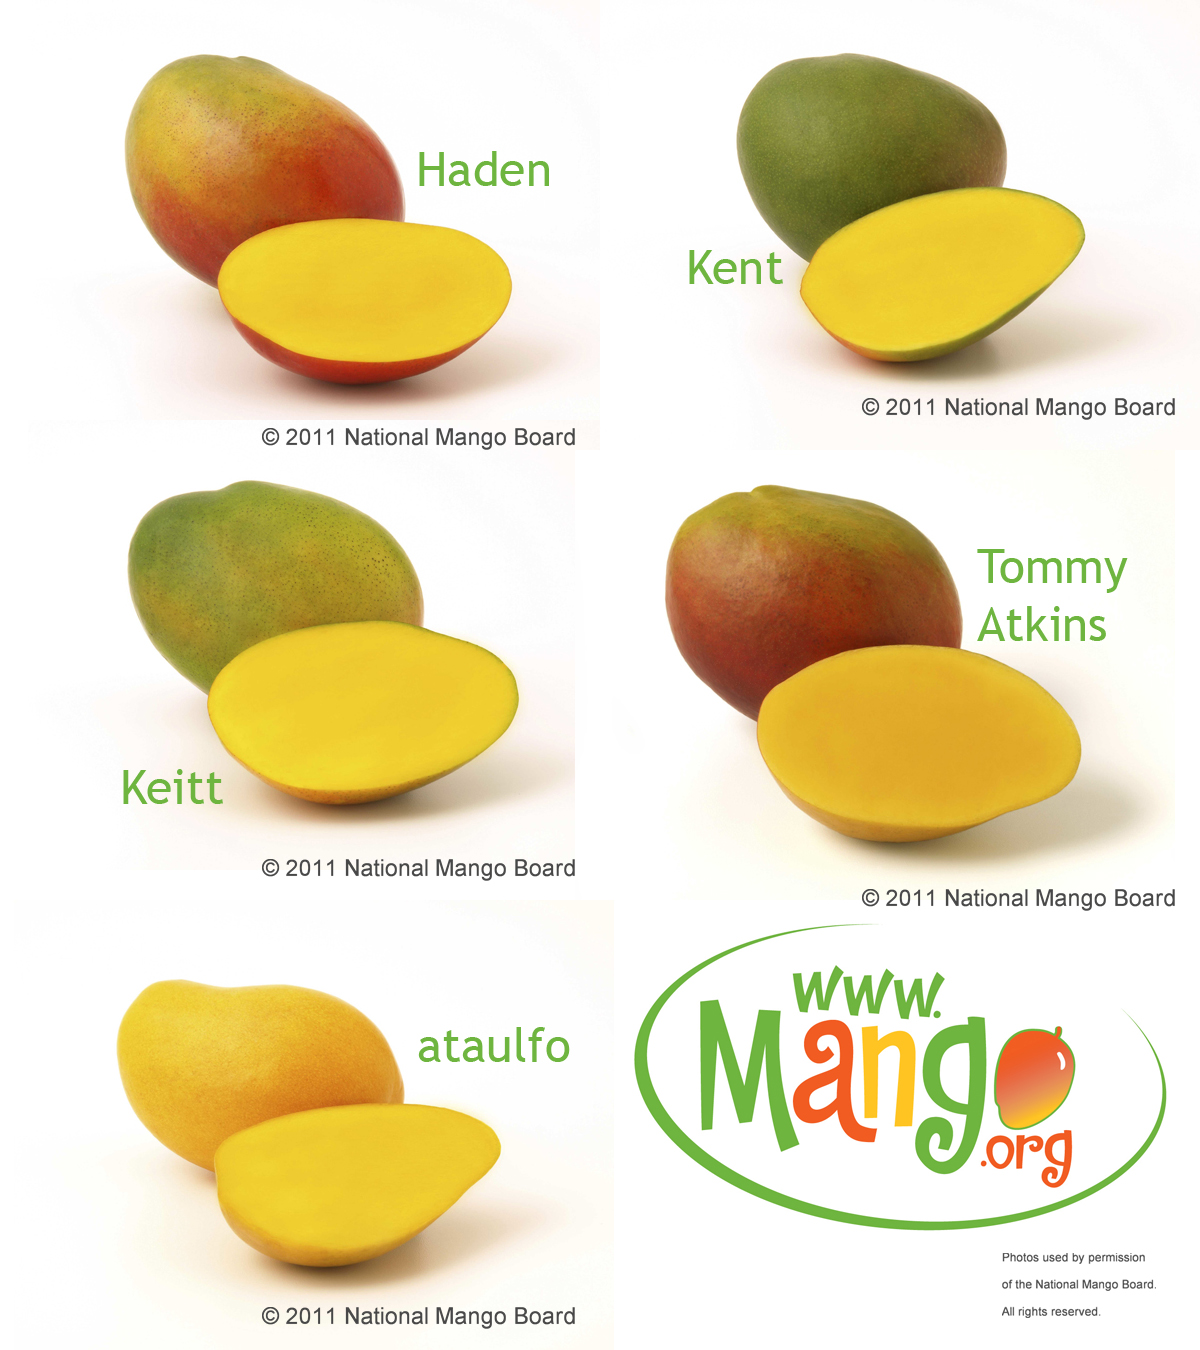 Mango Varieties Mangolicious Pat Eby; A Food Writer Skinnies Up How To Eat  A Mango